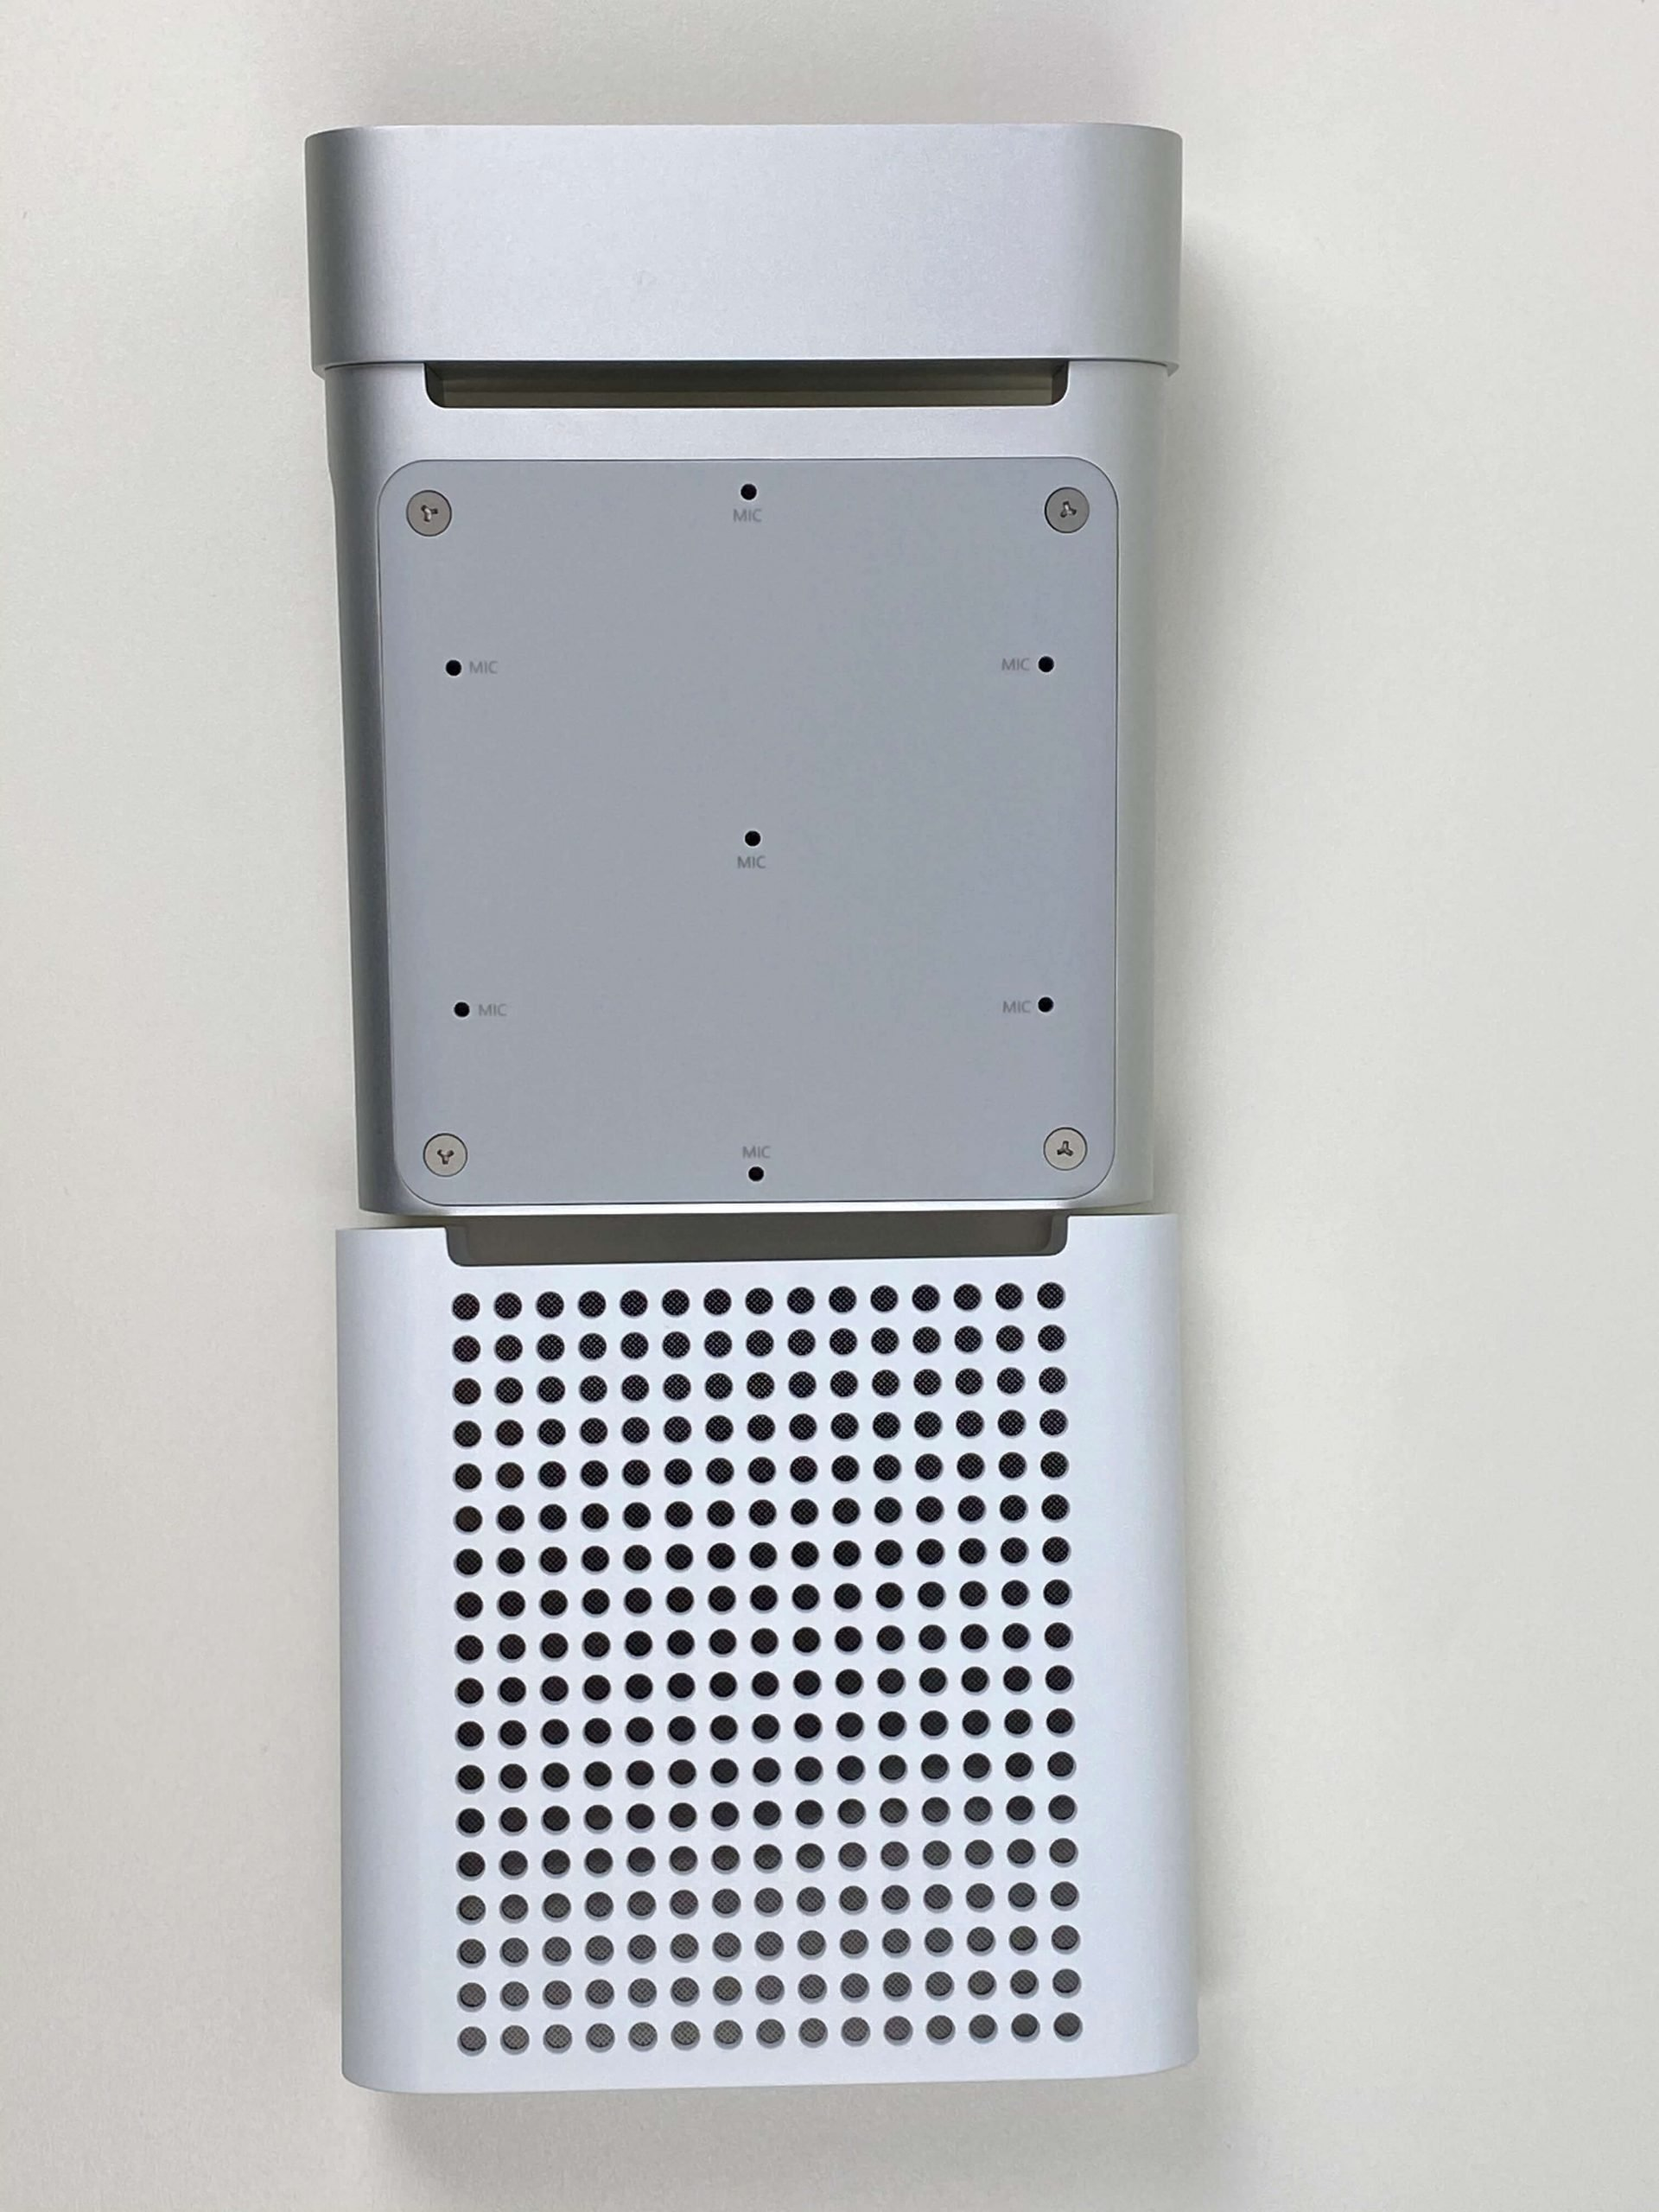 Azure Kinect Sensor - Top